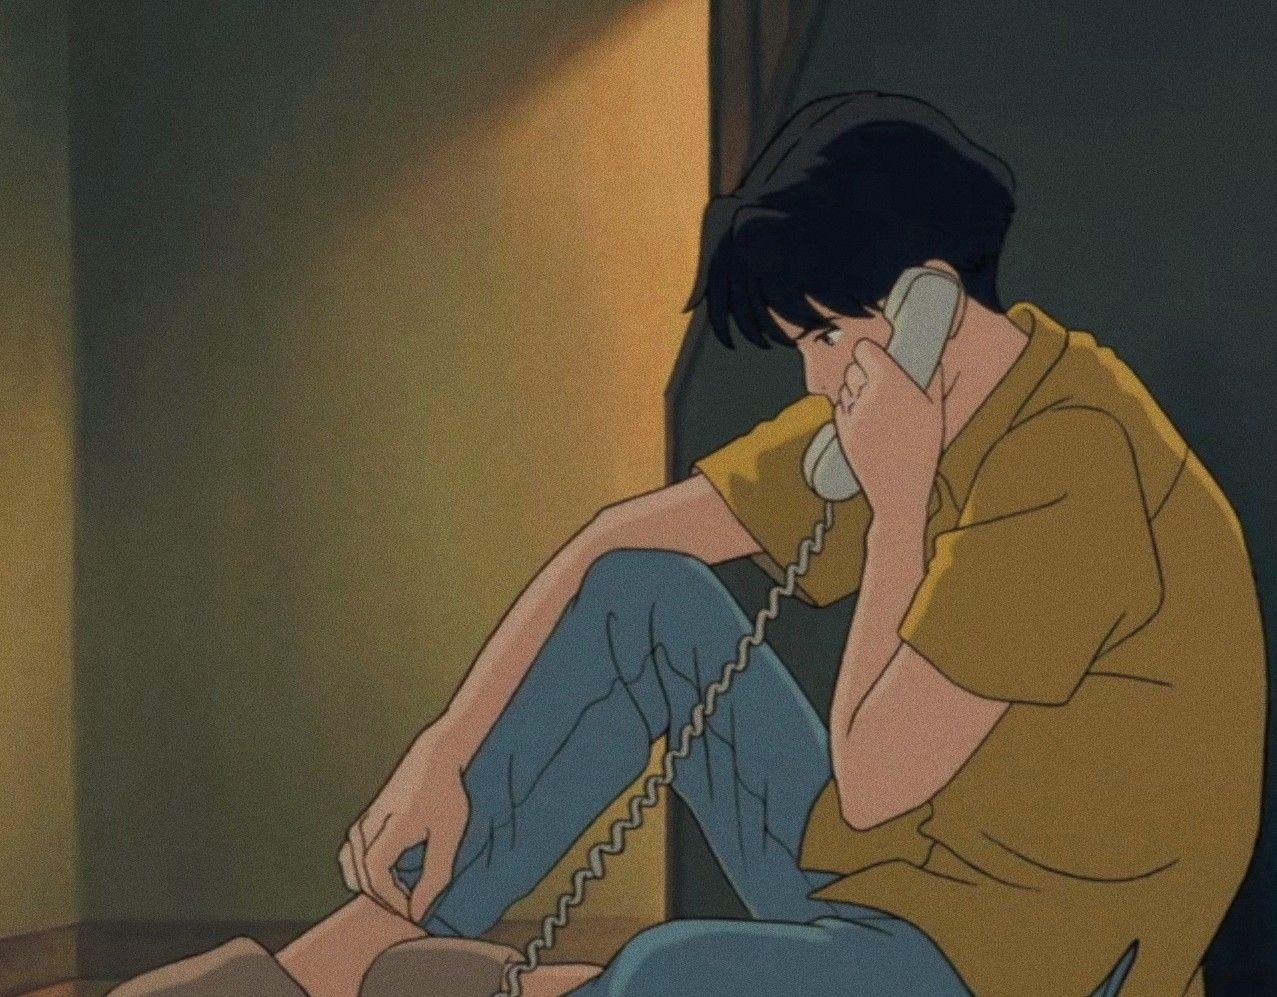 Aesthetic Anime Boy In 2020 Aesthetic Anime Anime Wallpaper Anime